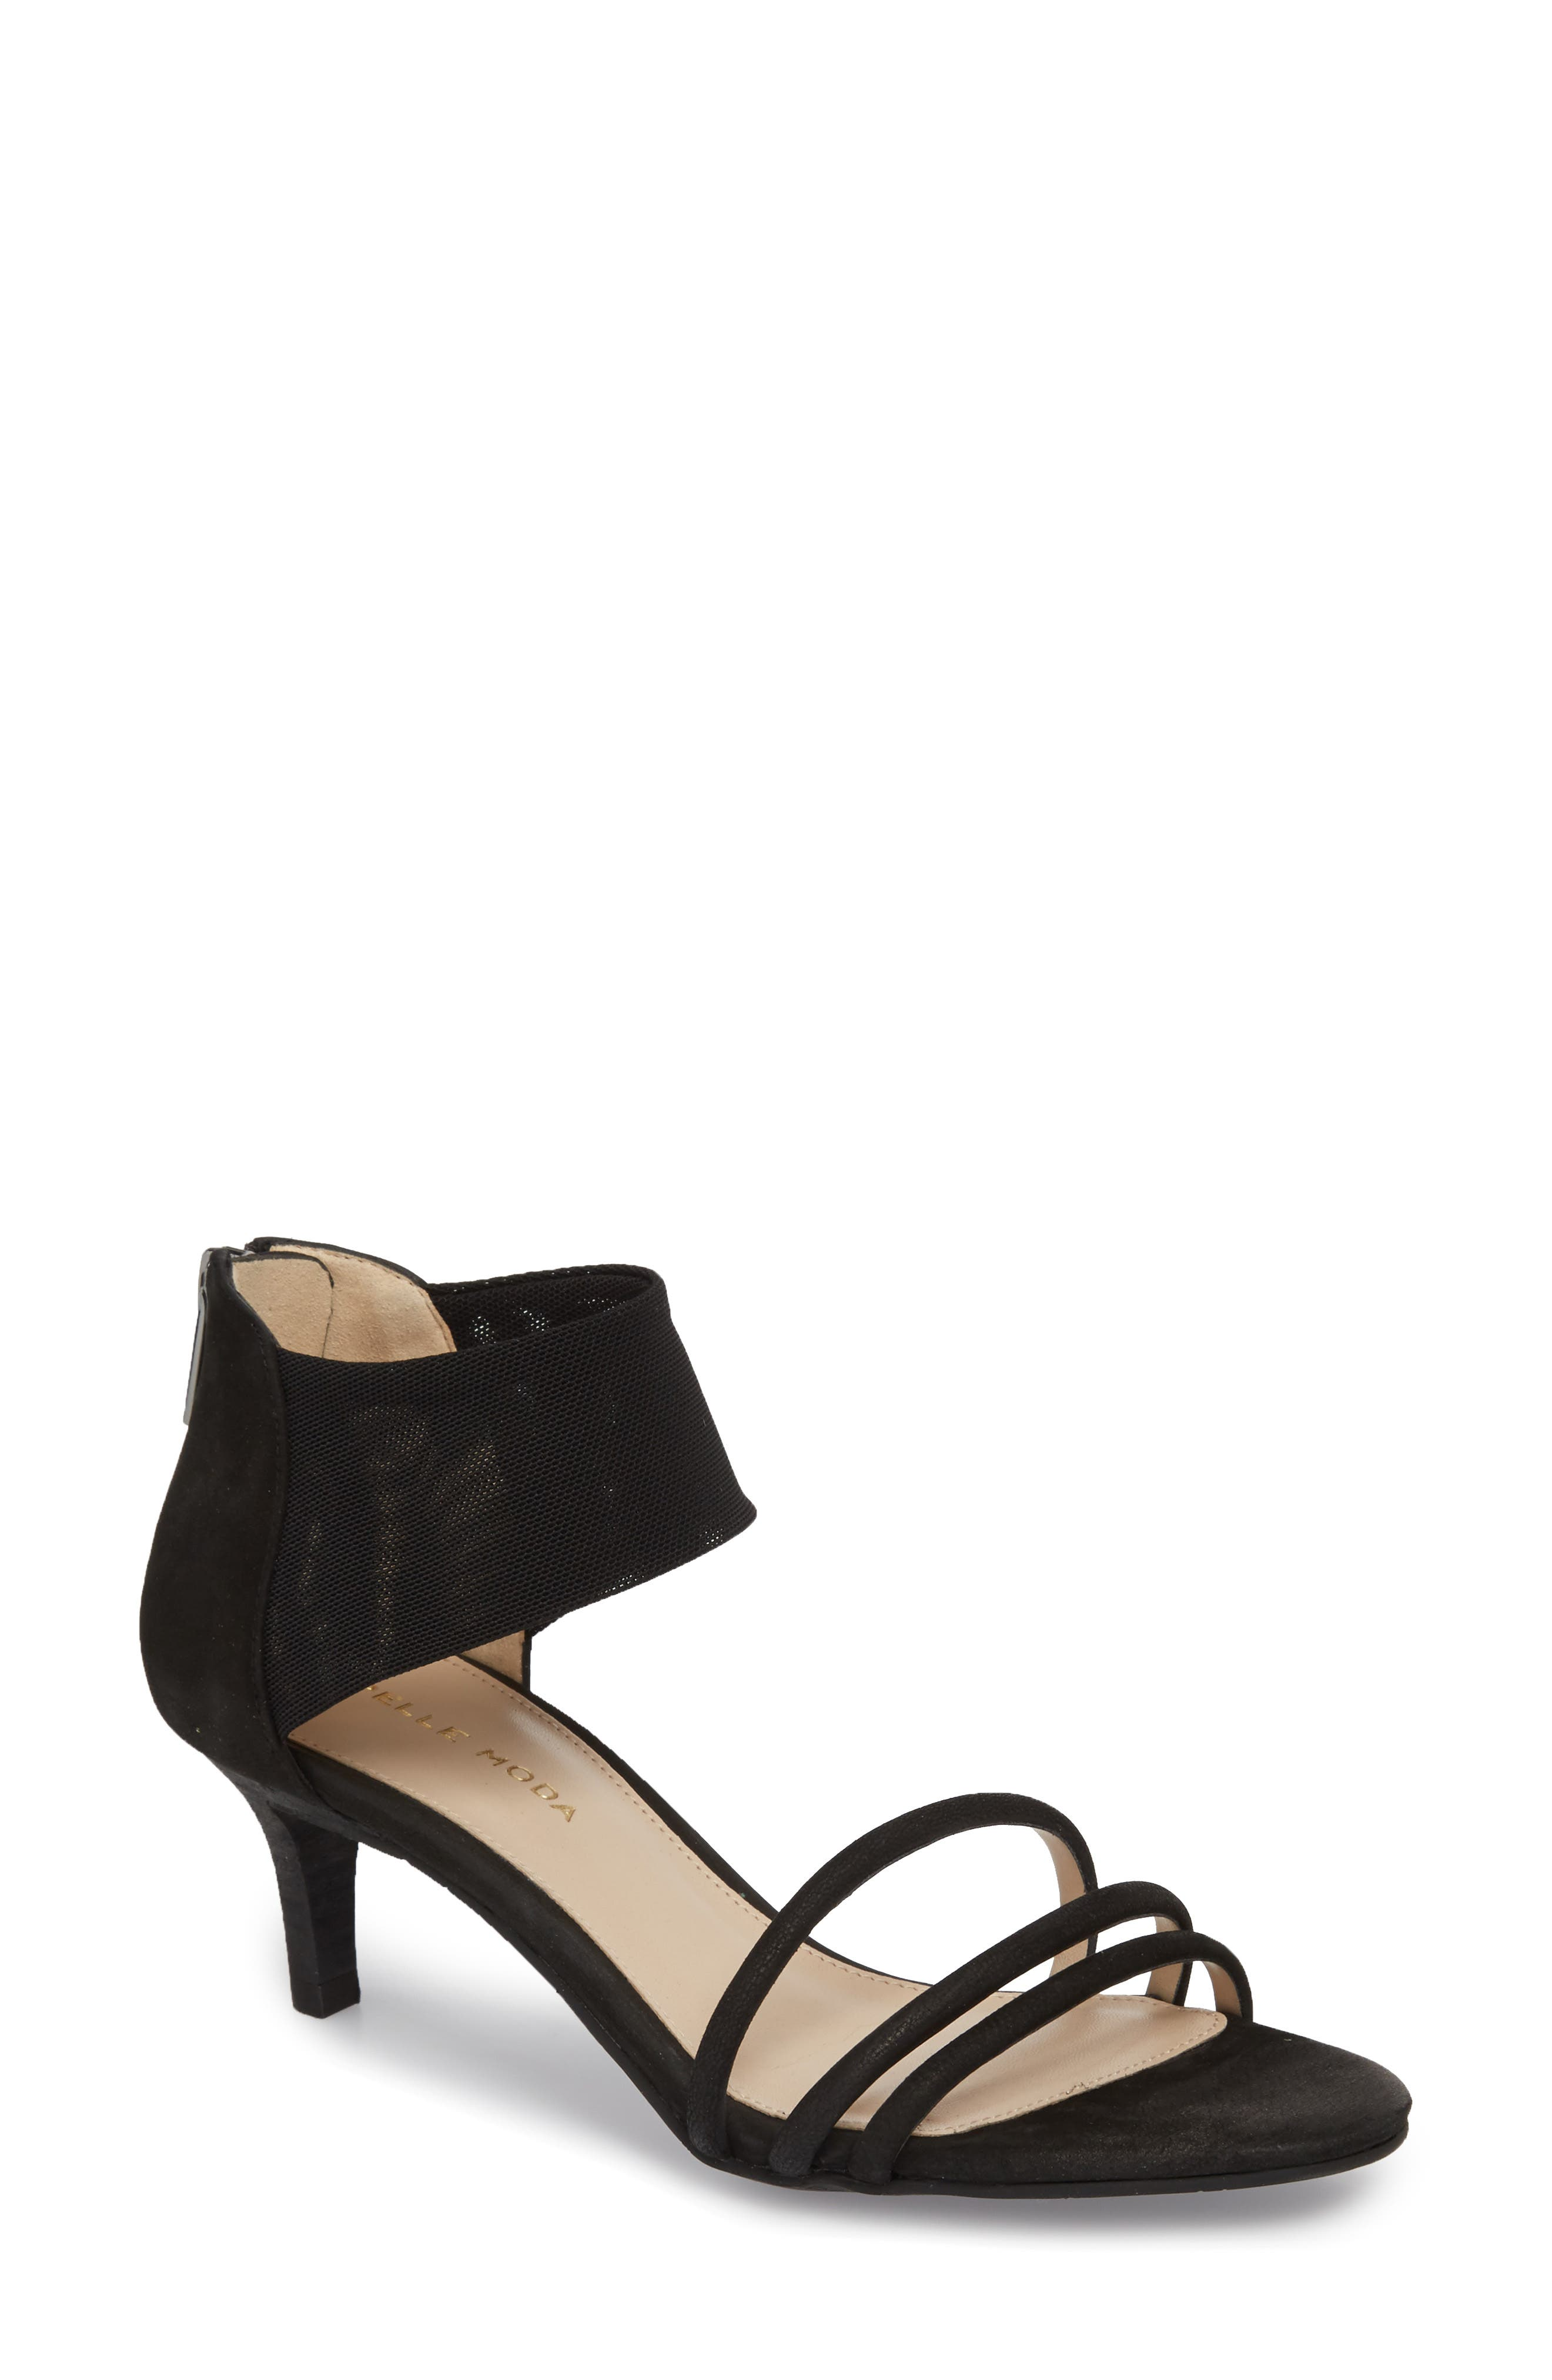 Berri Ankle Cuff Sandal,                         Main,                         color,